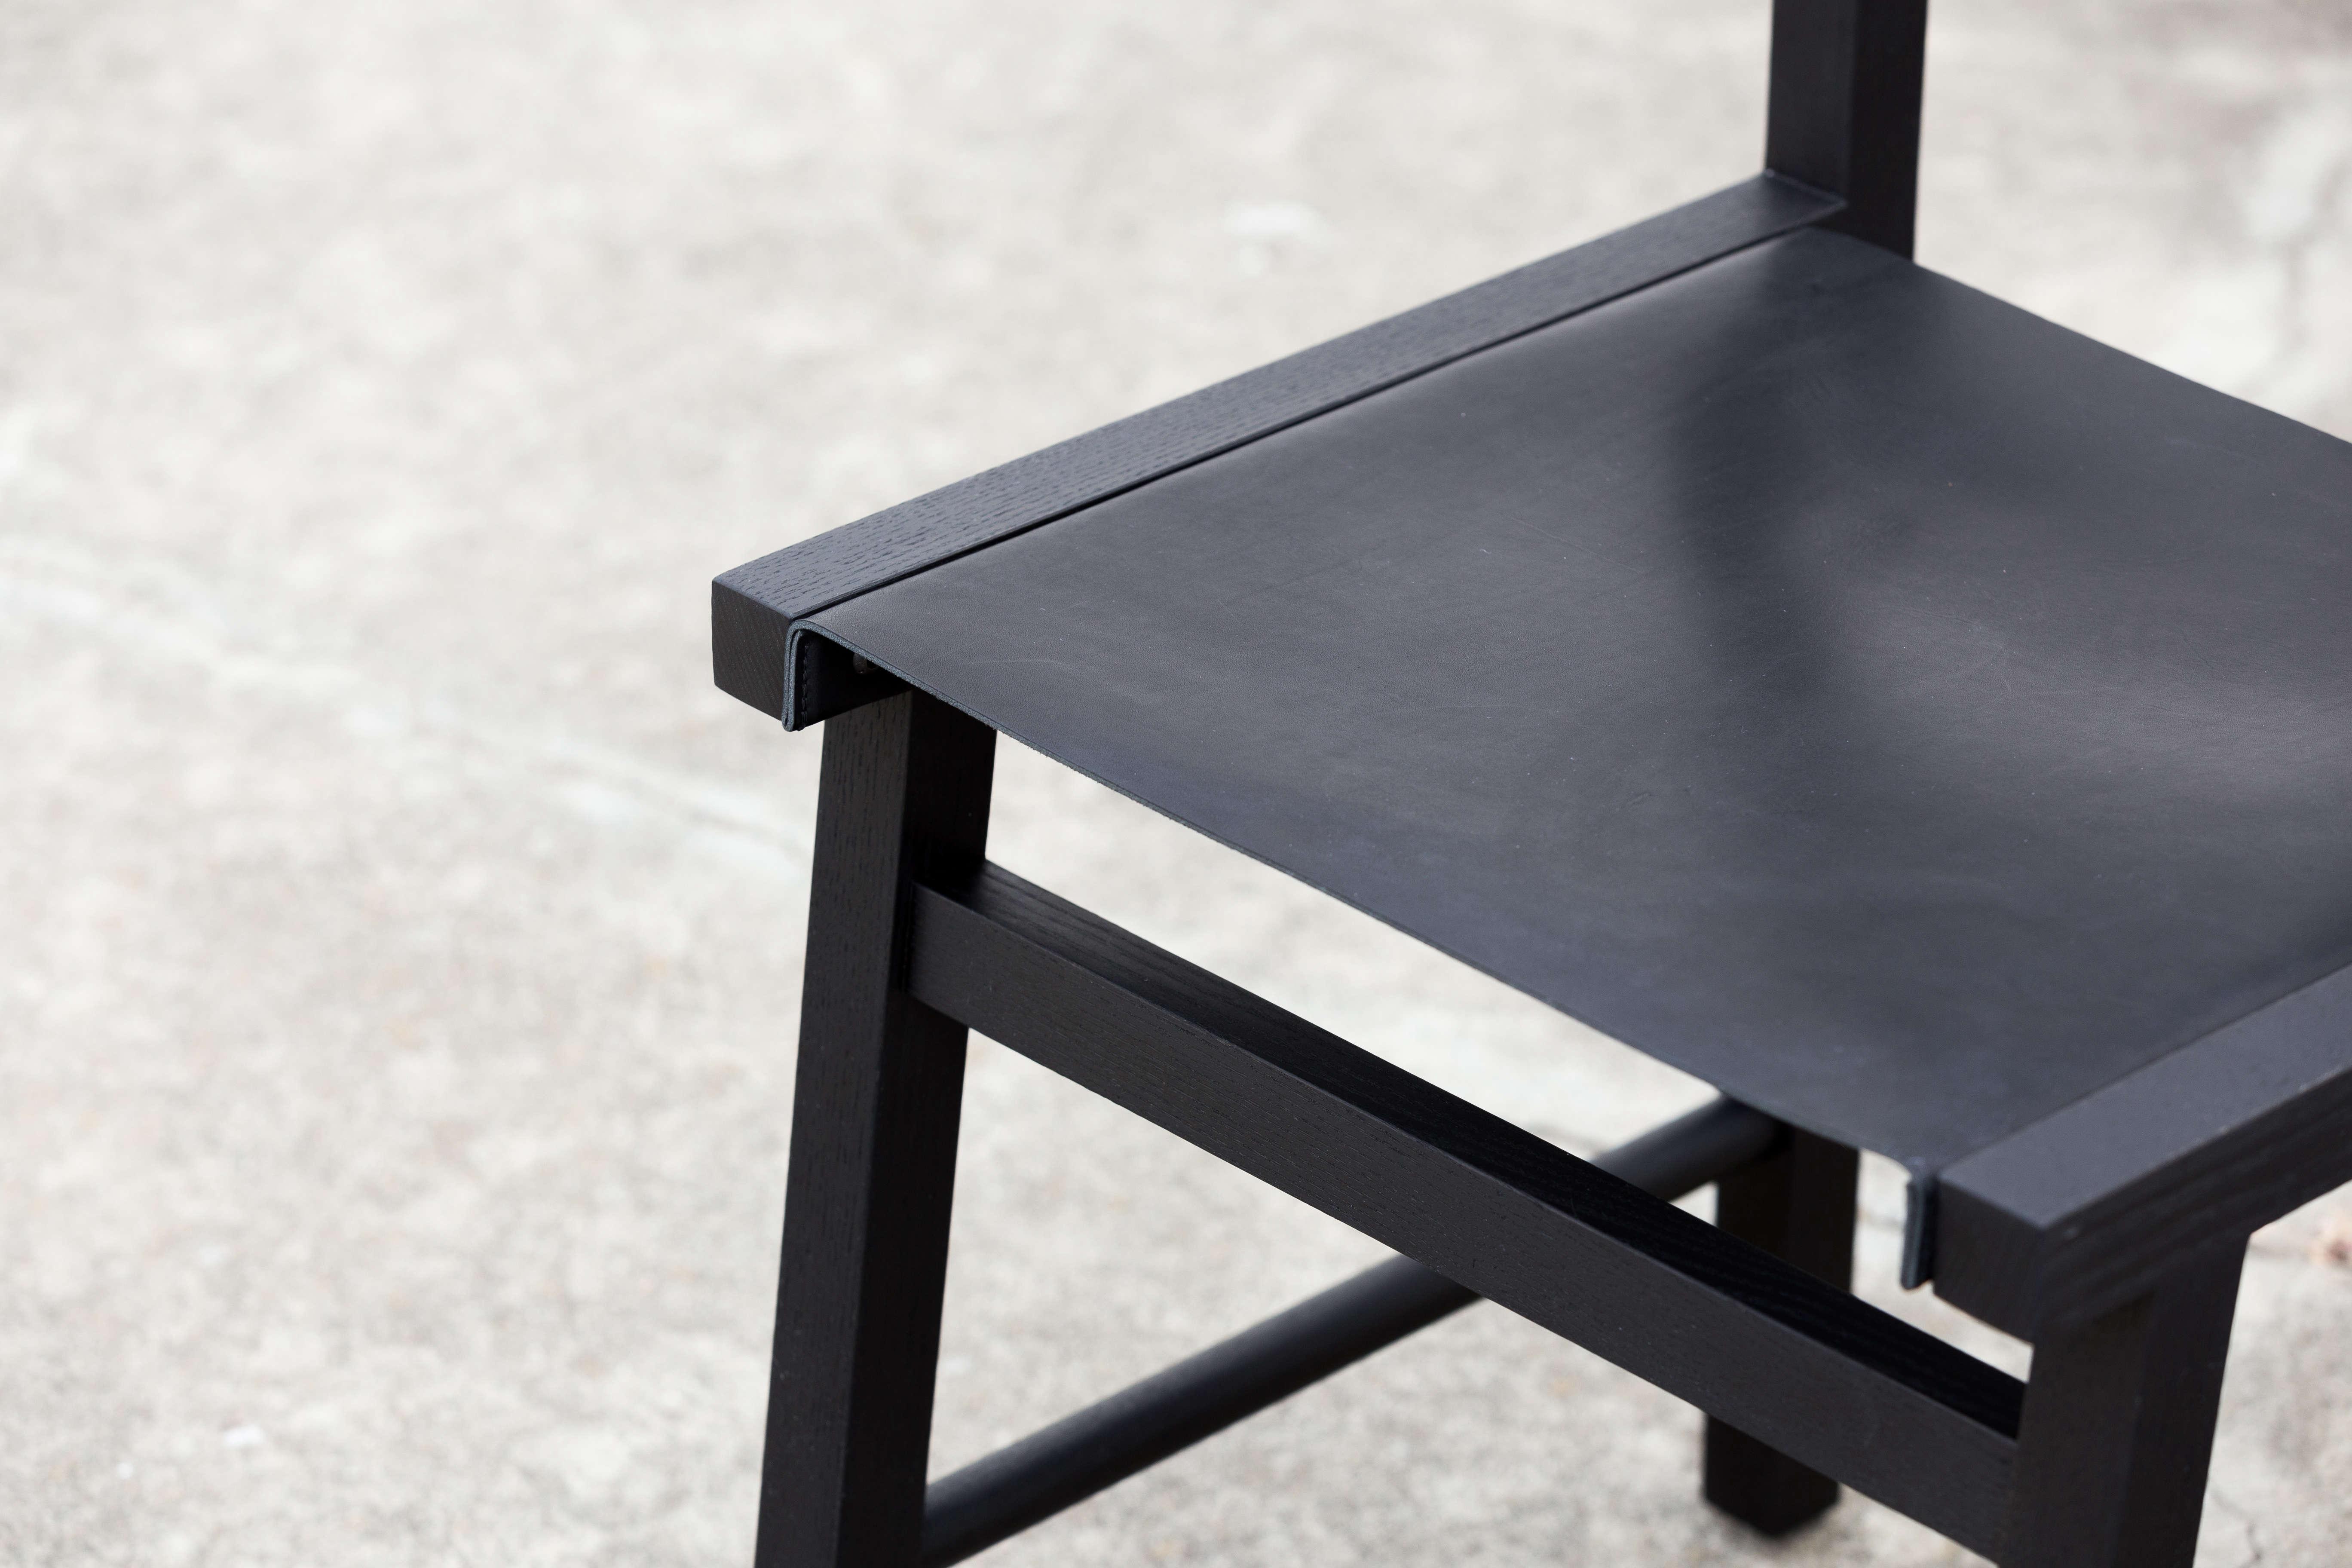 Fundamental Furniture From Four Quarter In San Francisco